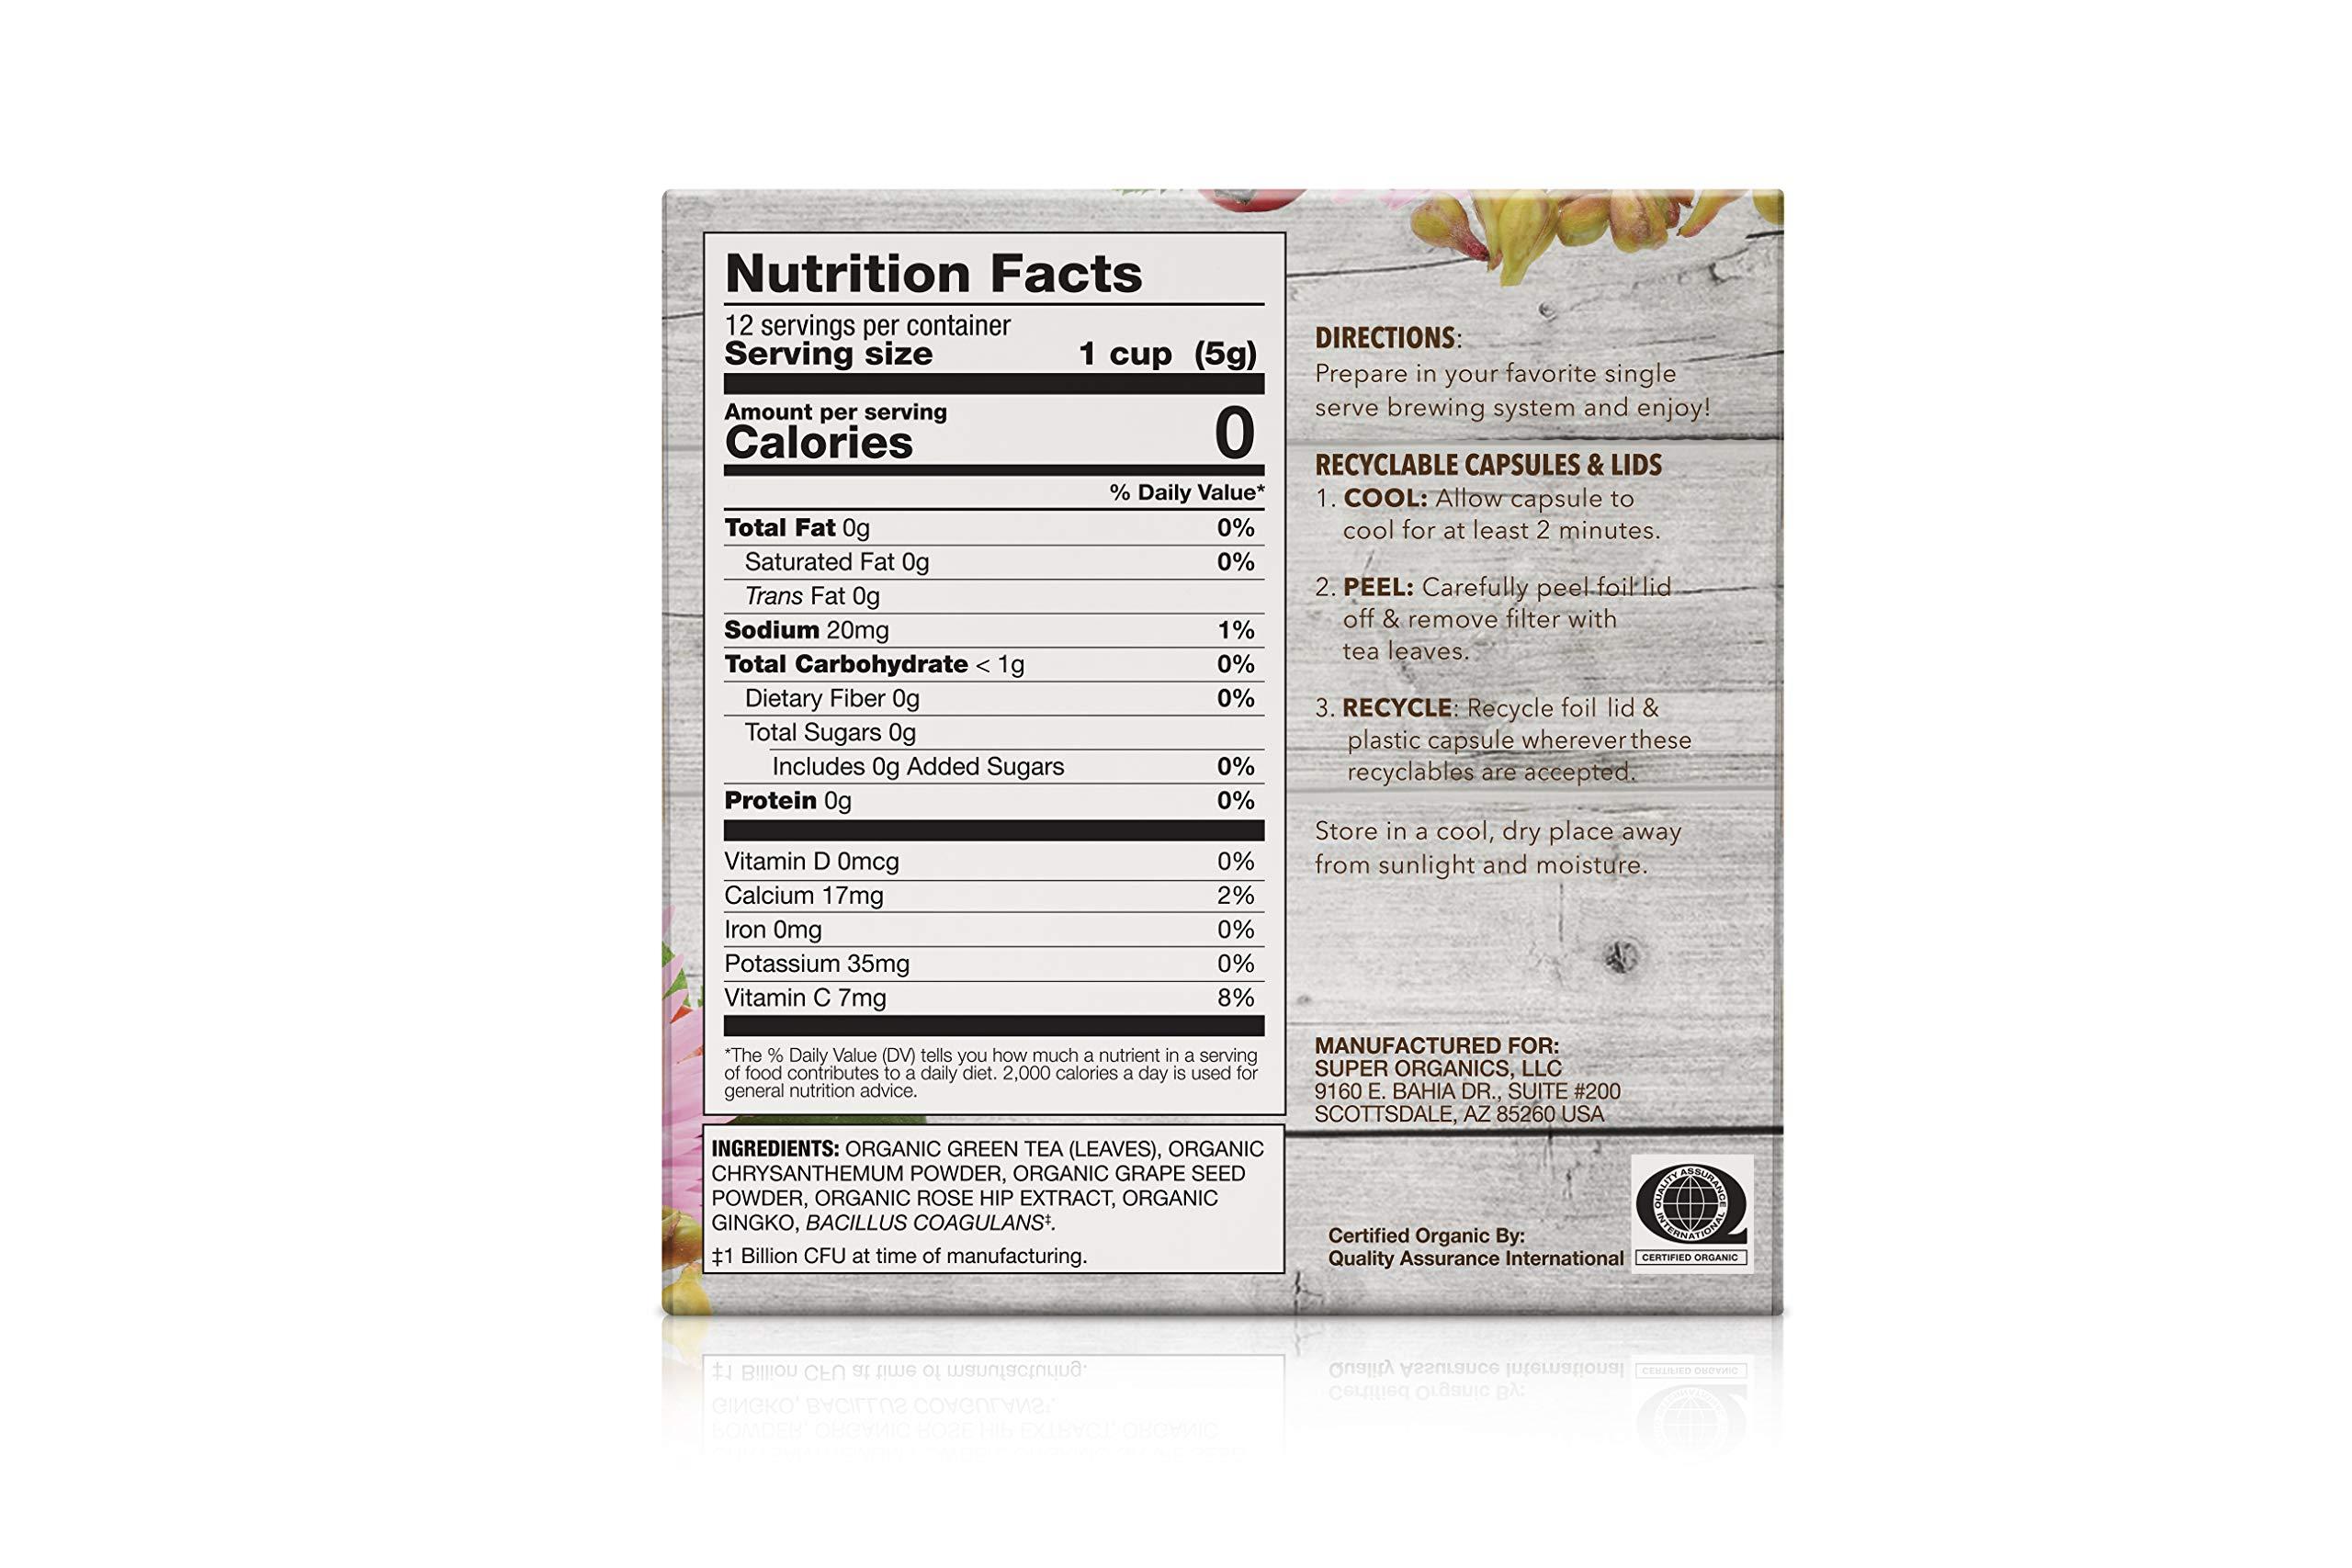 Super Organics Beauty Boost Green Tea Pods With Superfoods & Probiotics | Keurig K-Cup Compatible | Beauty Tea, Skin Care Tea | USDA Certified Organic, Vegan, Non-GMO Natural & Delicious Tea, 72ct by Super Organics (Image #2)